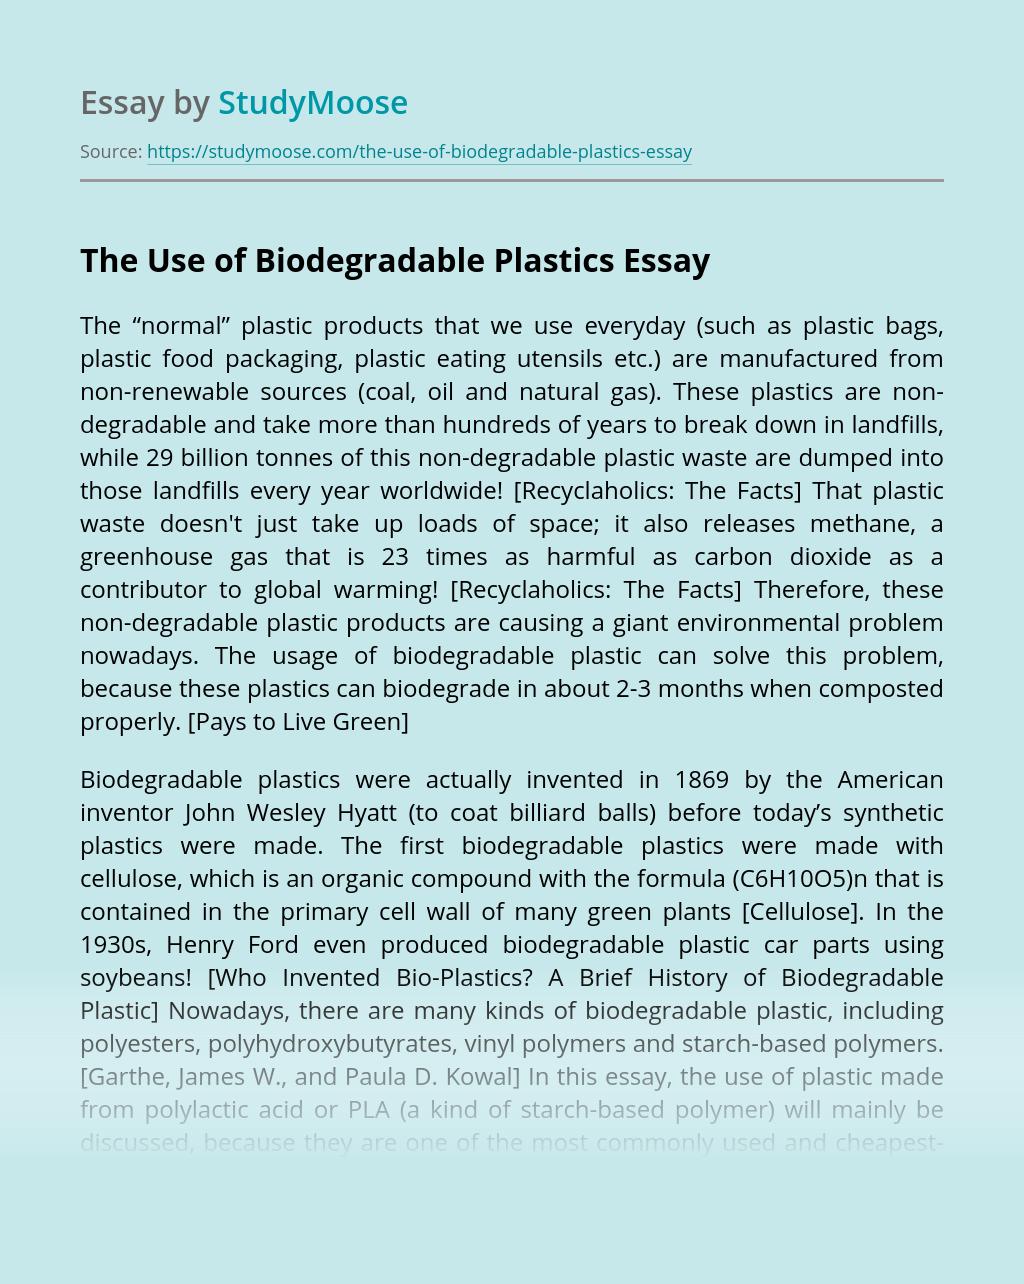 The Use of Biodegradable Plastics